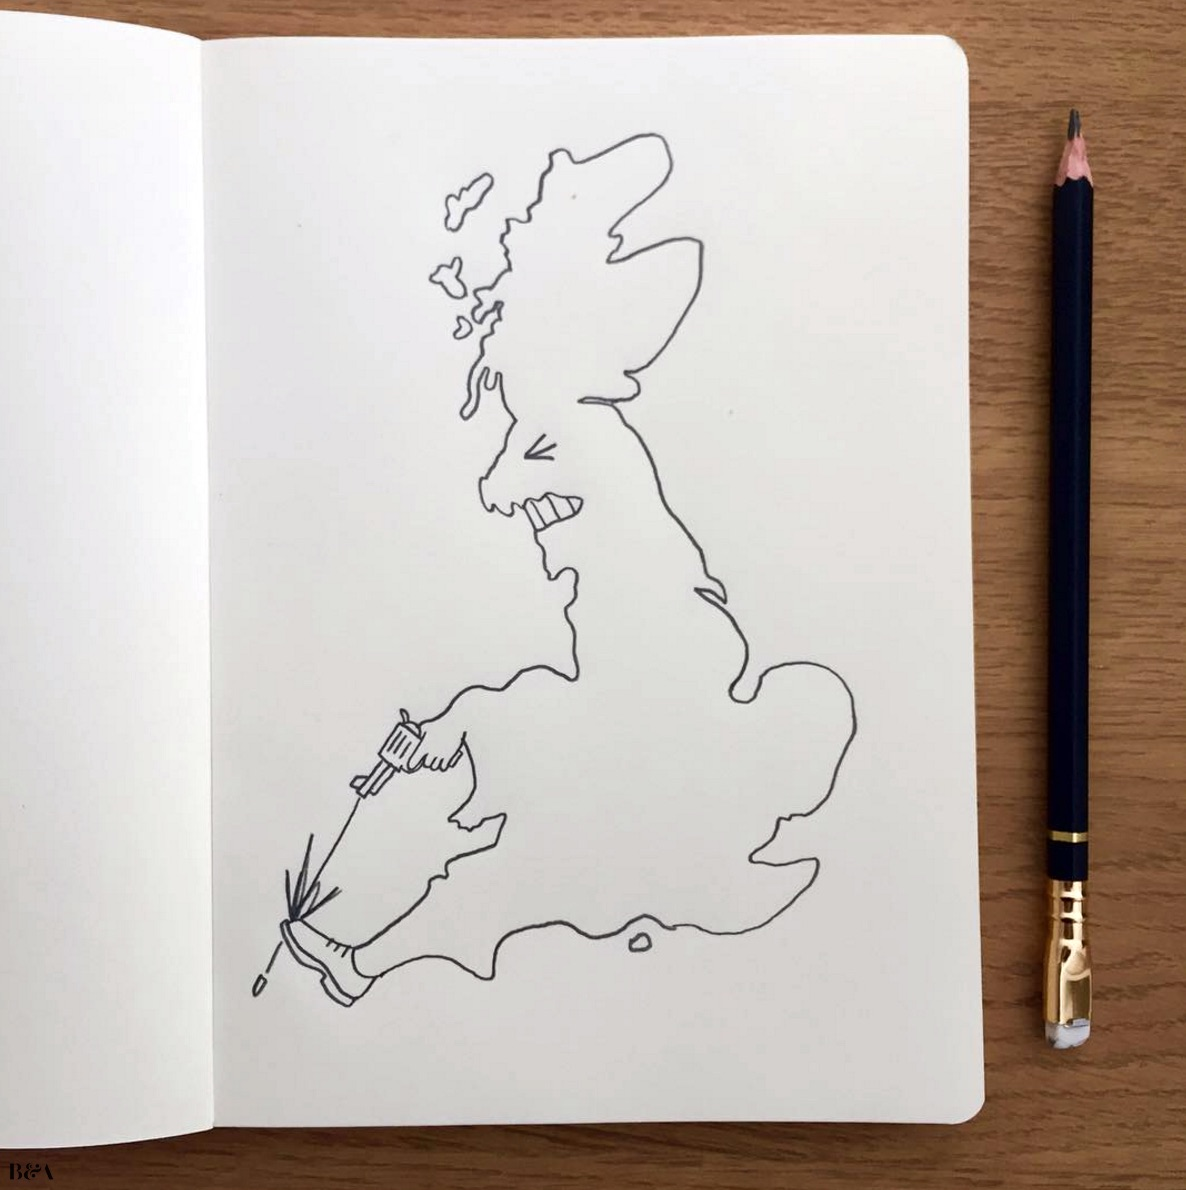 BI_160629_brexit_andrew_rae